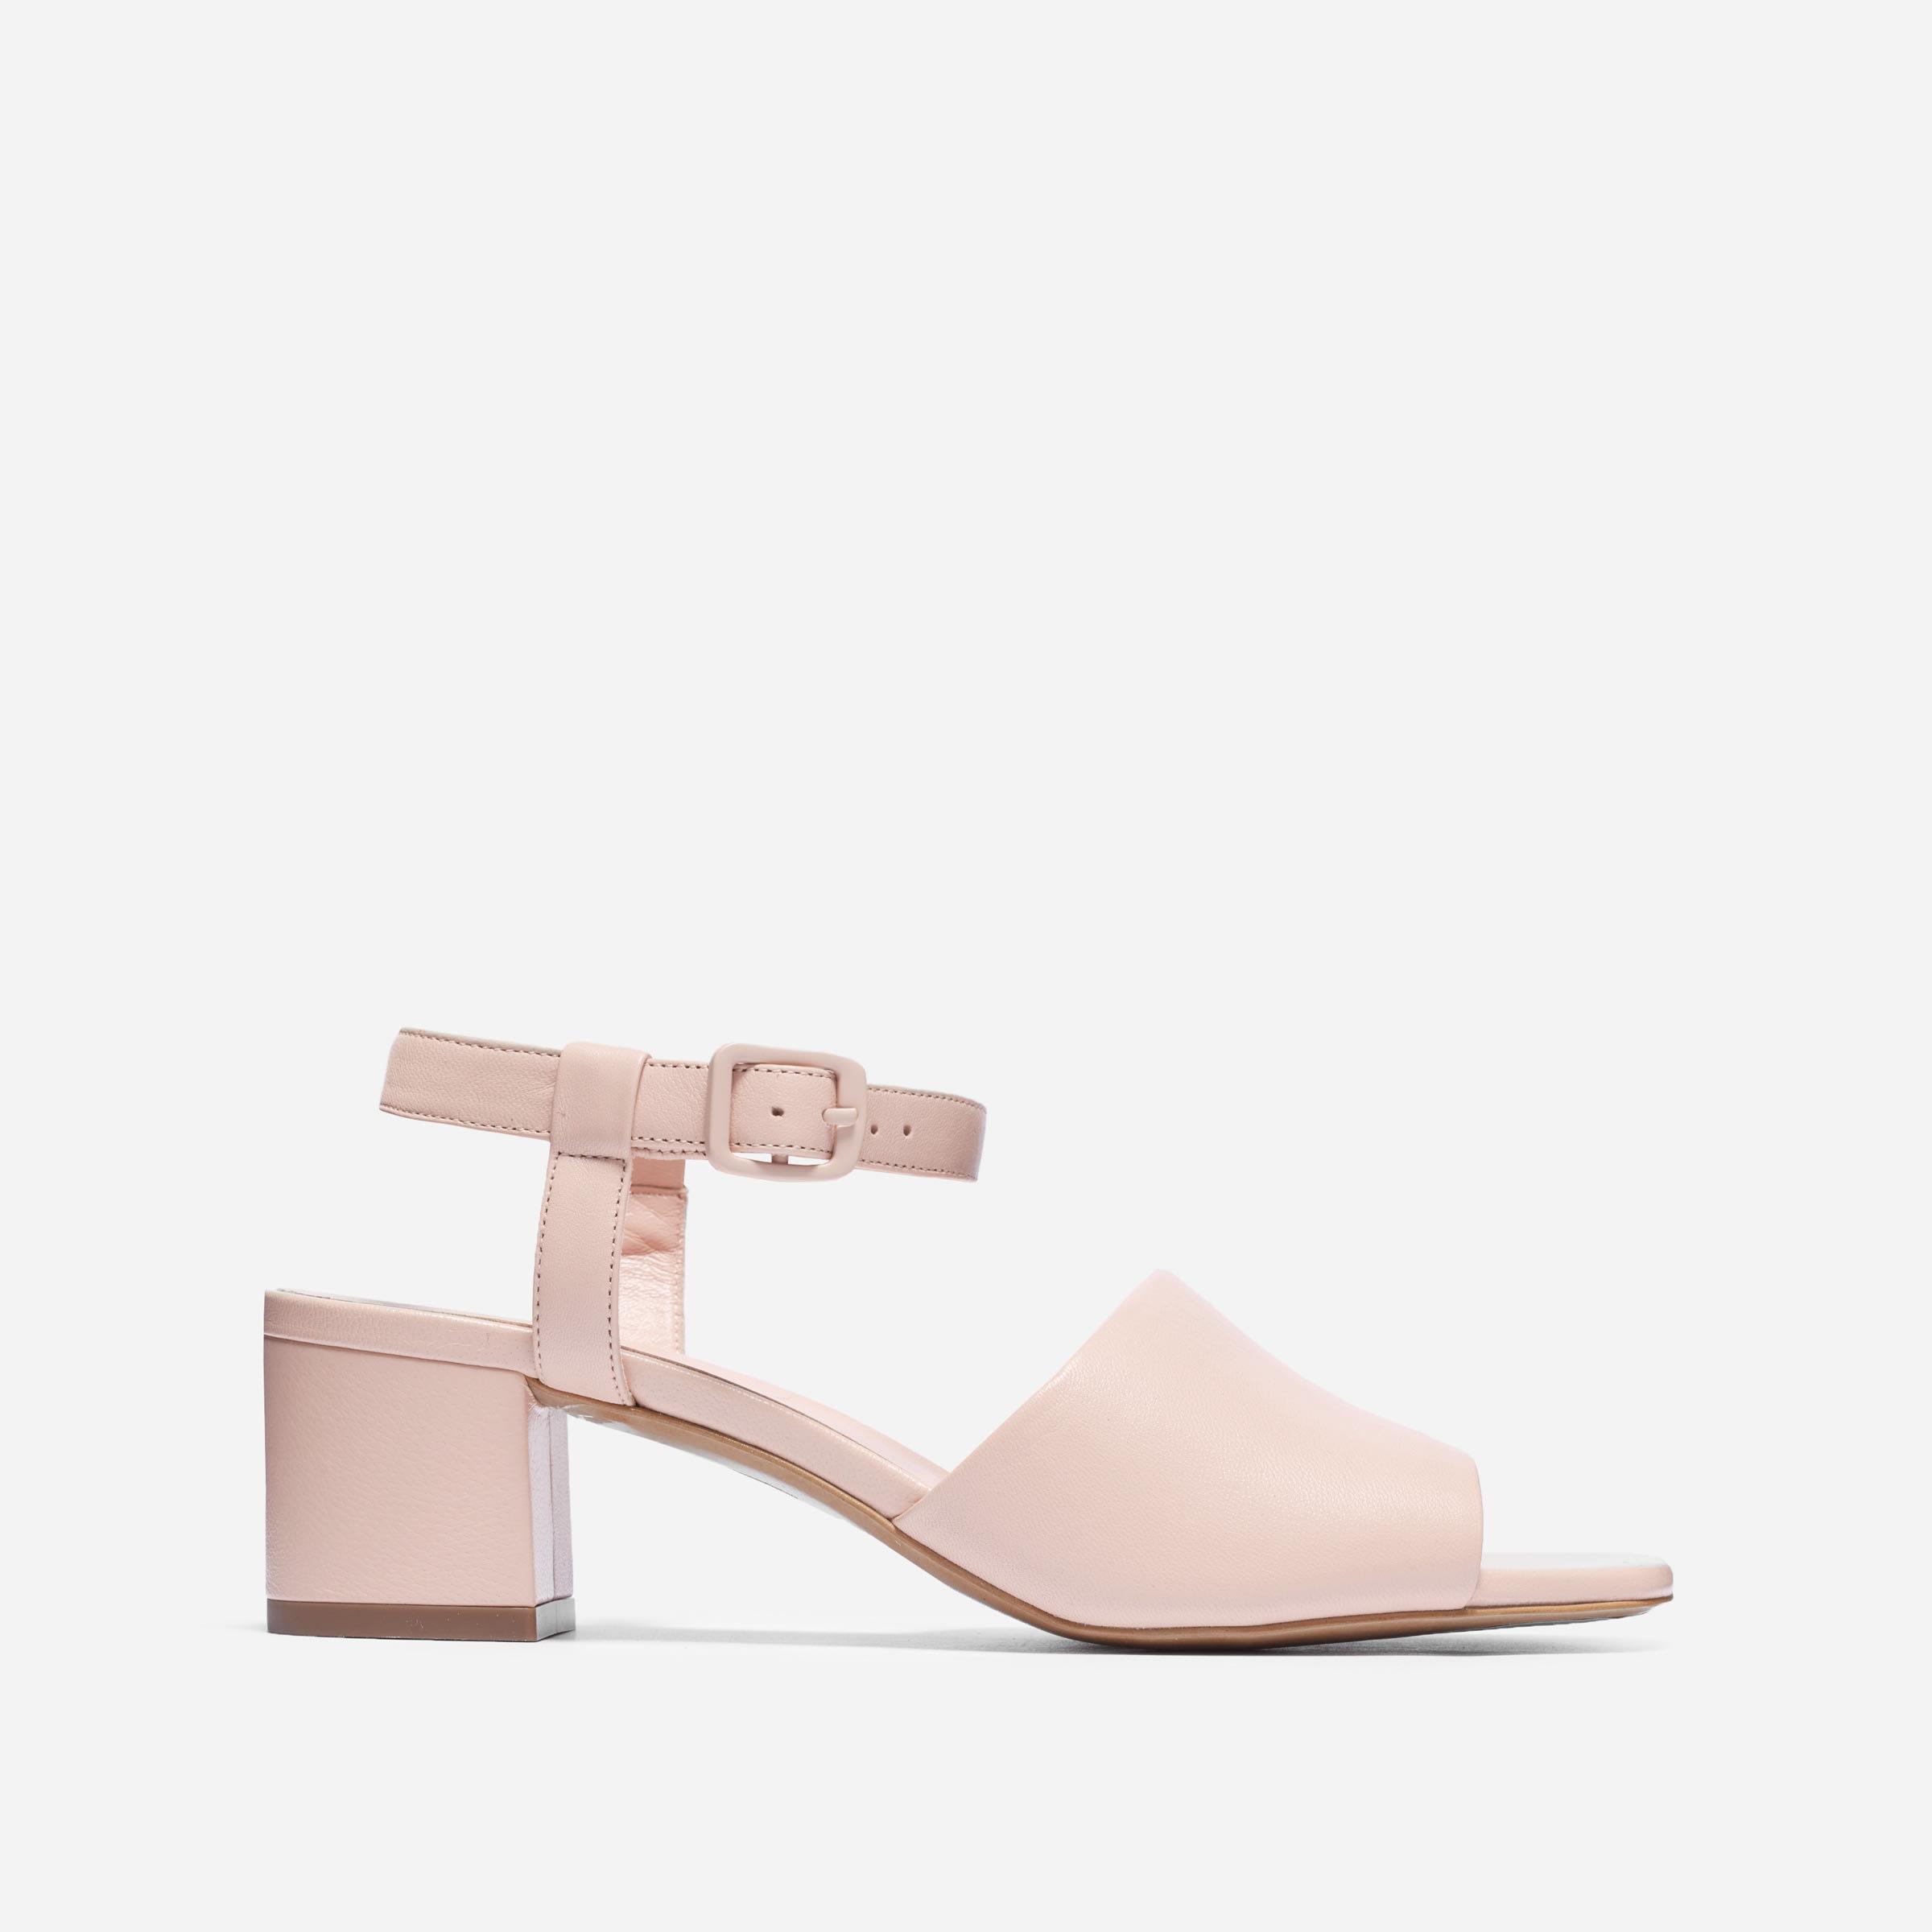 7682e4c55ac Women s Block Heel Sandal